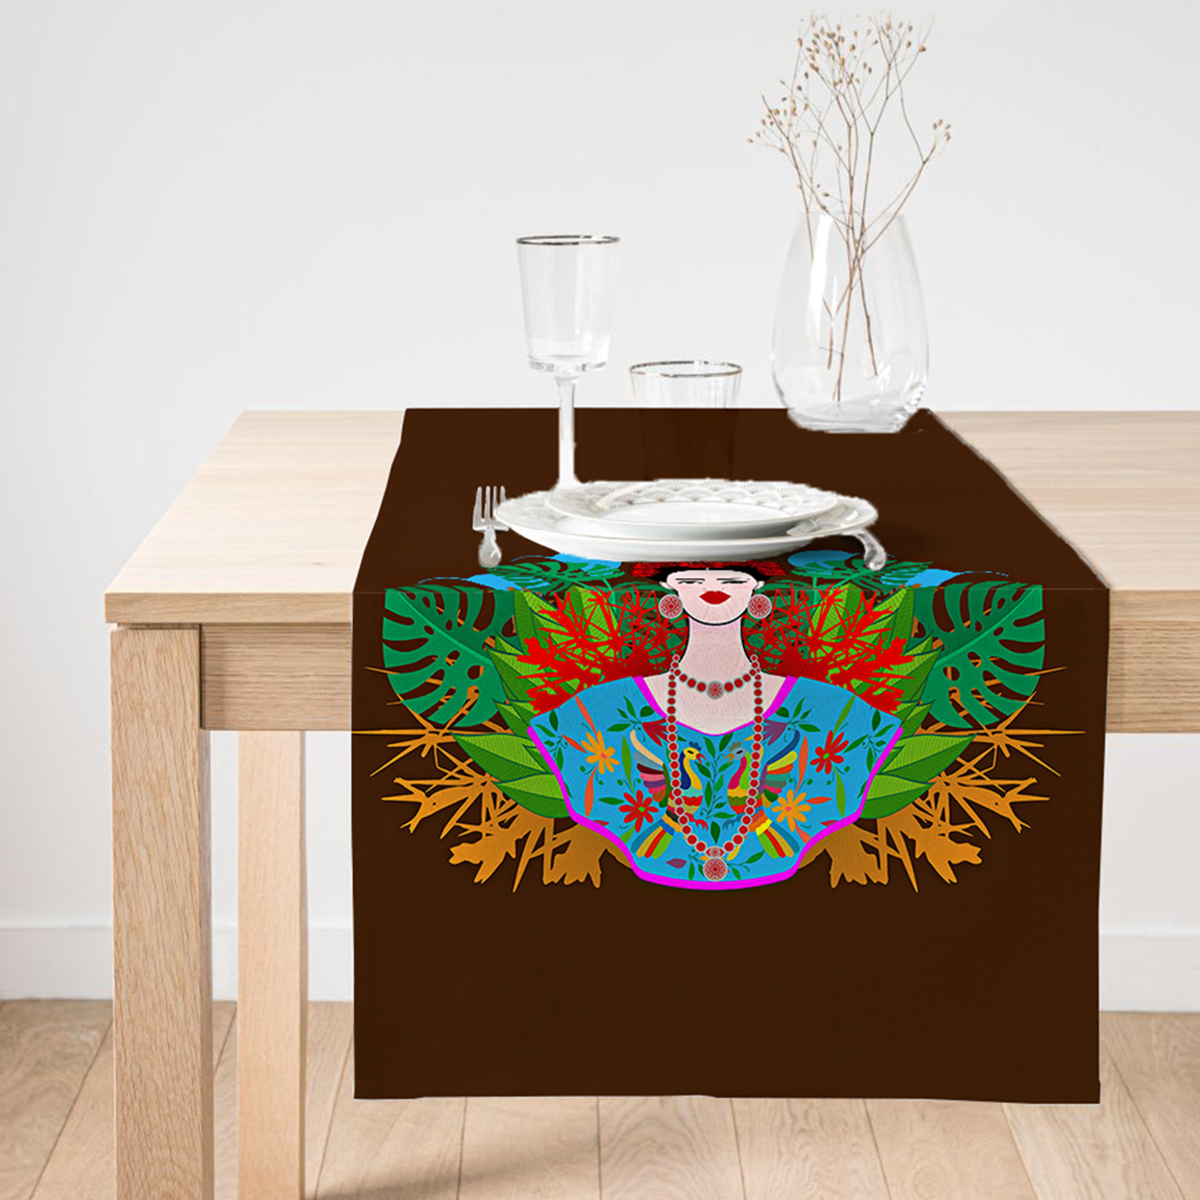 Realhomes Kahverengi Zeminde Özel Tasarım Frida Kahlo Baskılı Süet Runner Realhomes